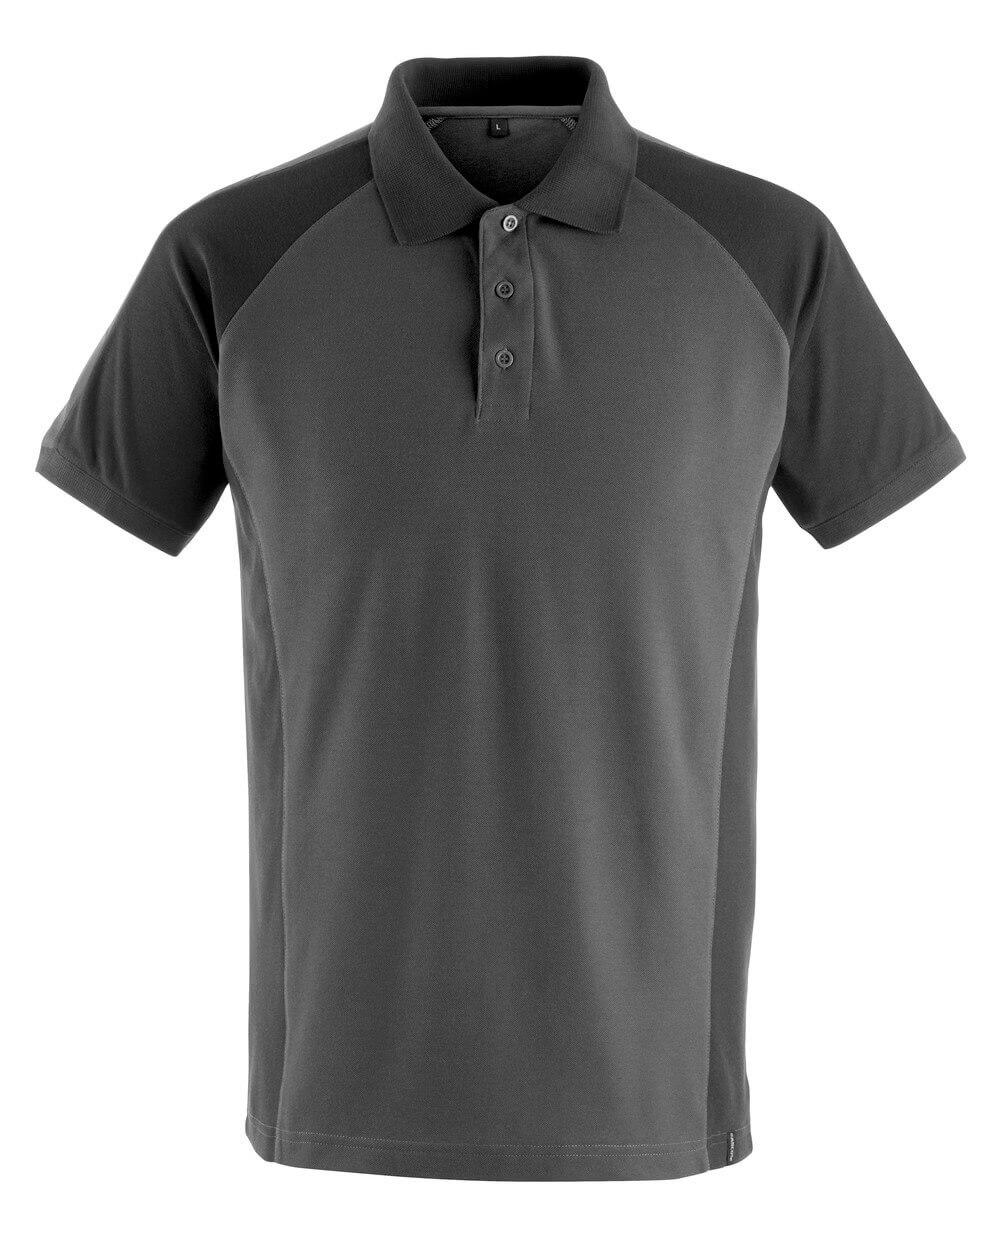 50569-961-1809 Polo-Shirt - Dunkelanthrazit/Schwarz